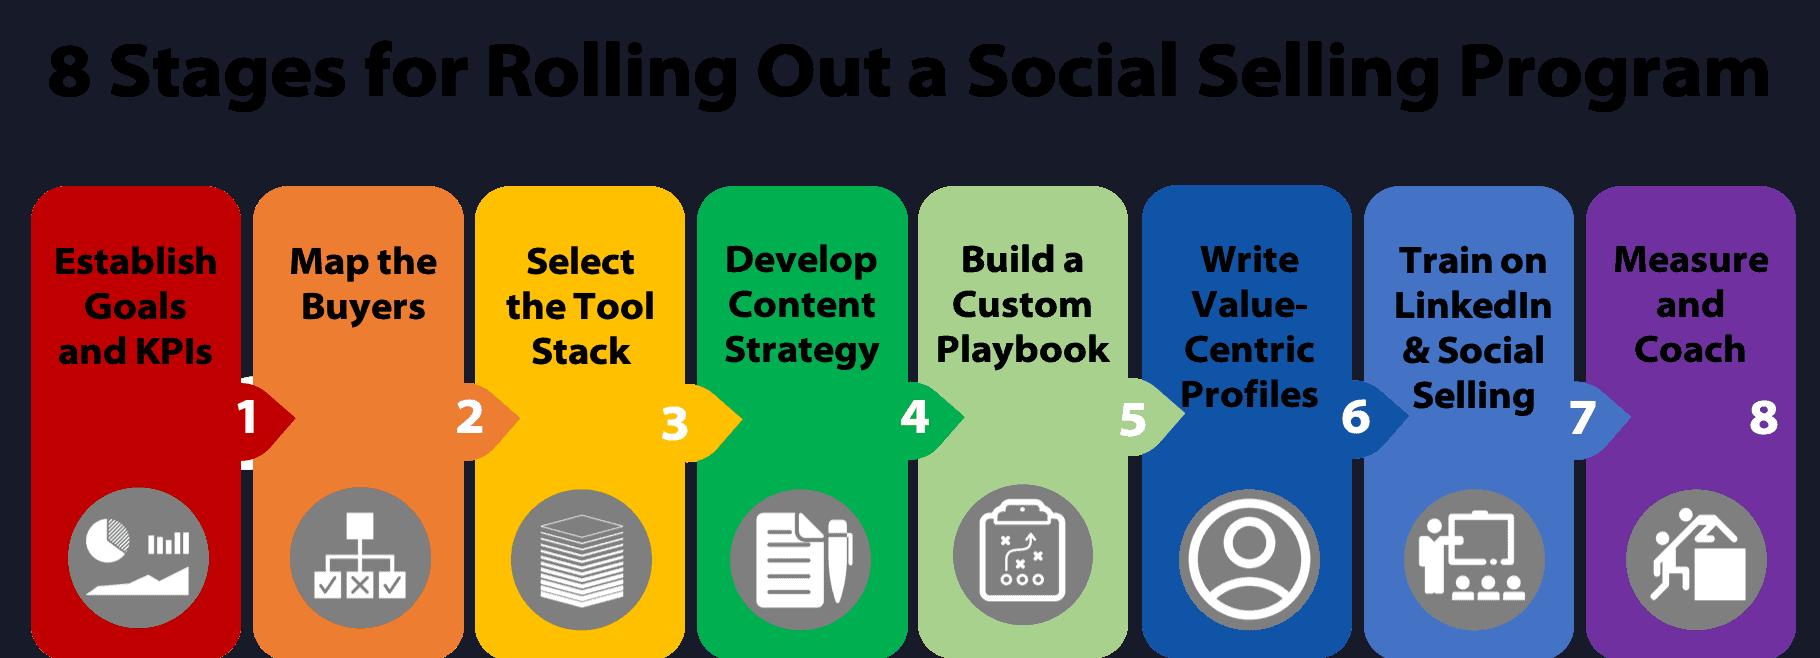 LinkedIn-and-Social-Selling-Training-Programs